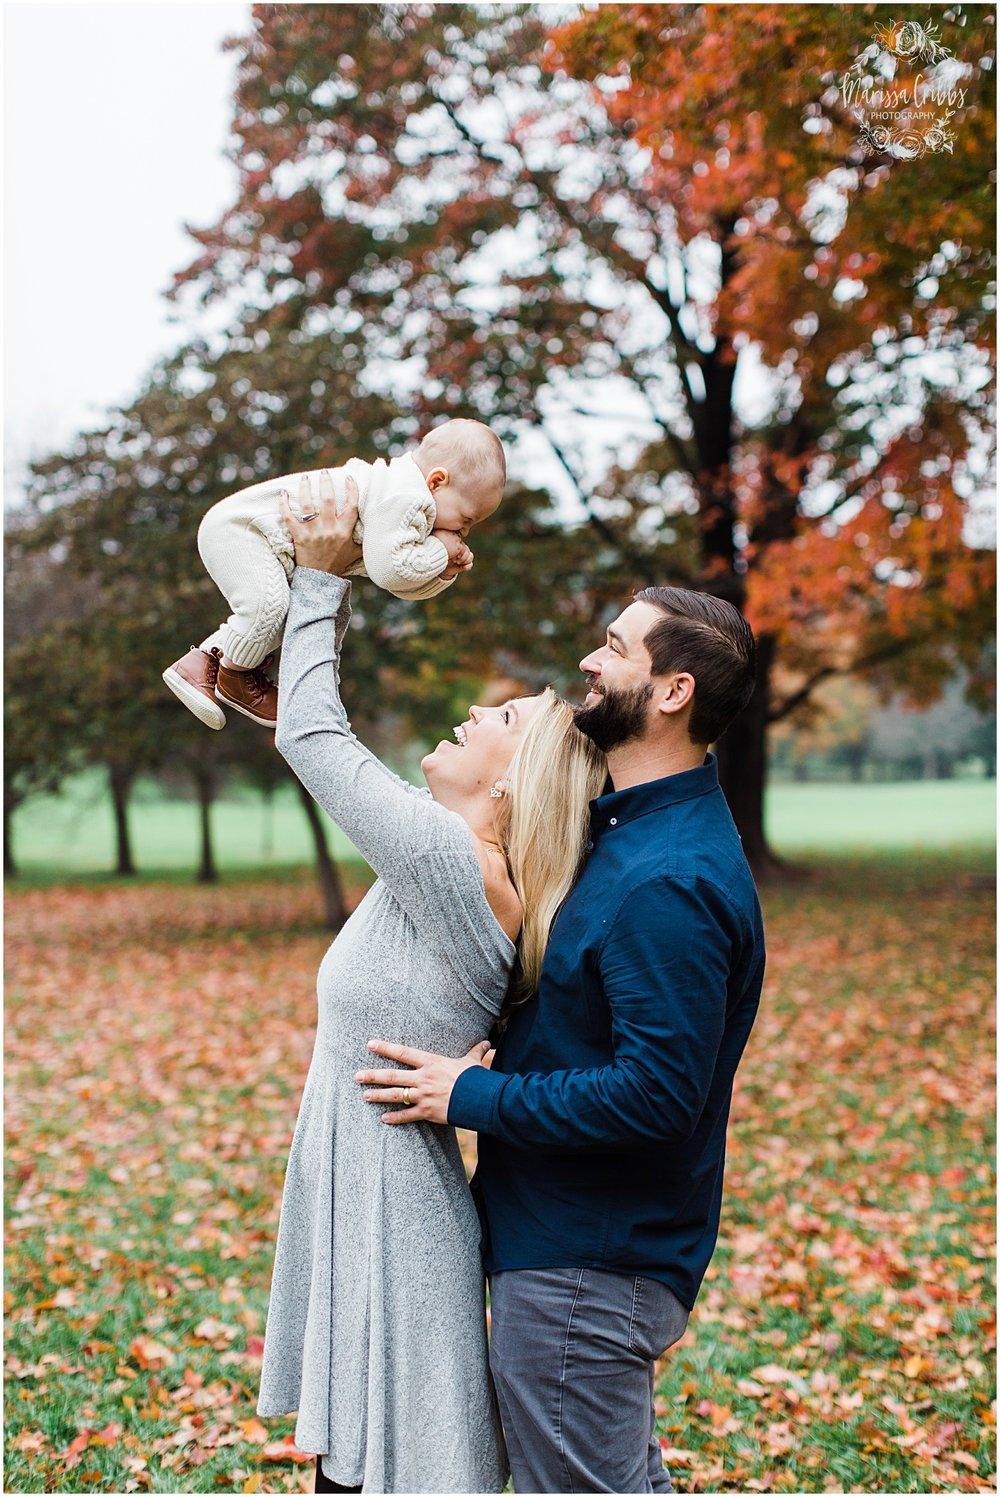 MILLER FAMILY LOOSE PARK | MARISSA CRIBBS PHOTOGRAPHY | KC FAMILY PHOTOGRAPHY_3810.jpg